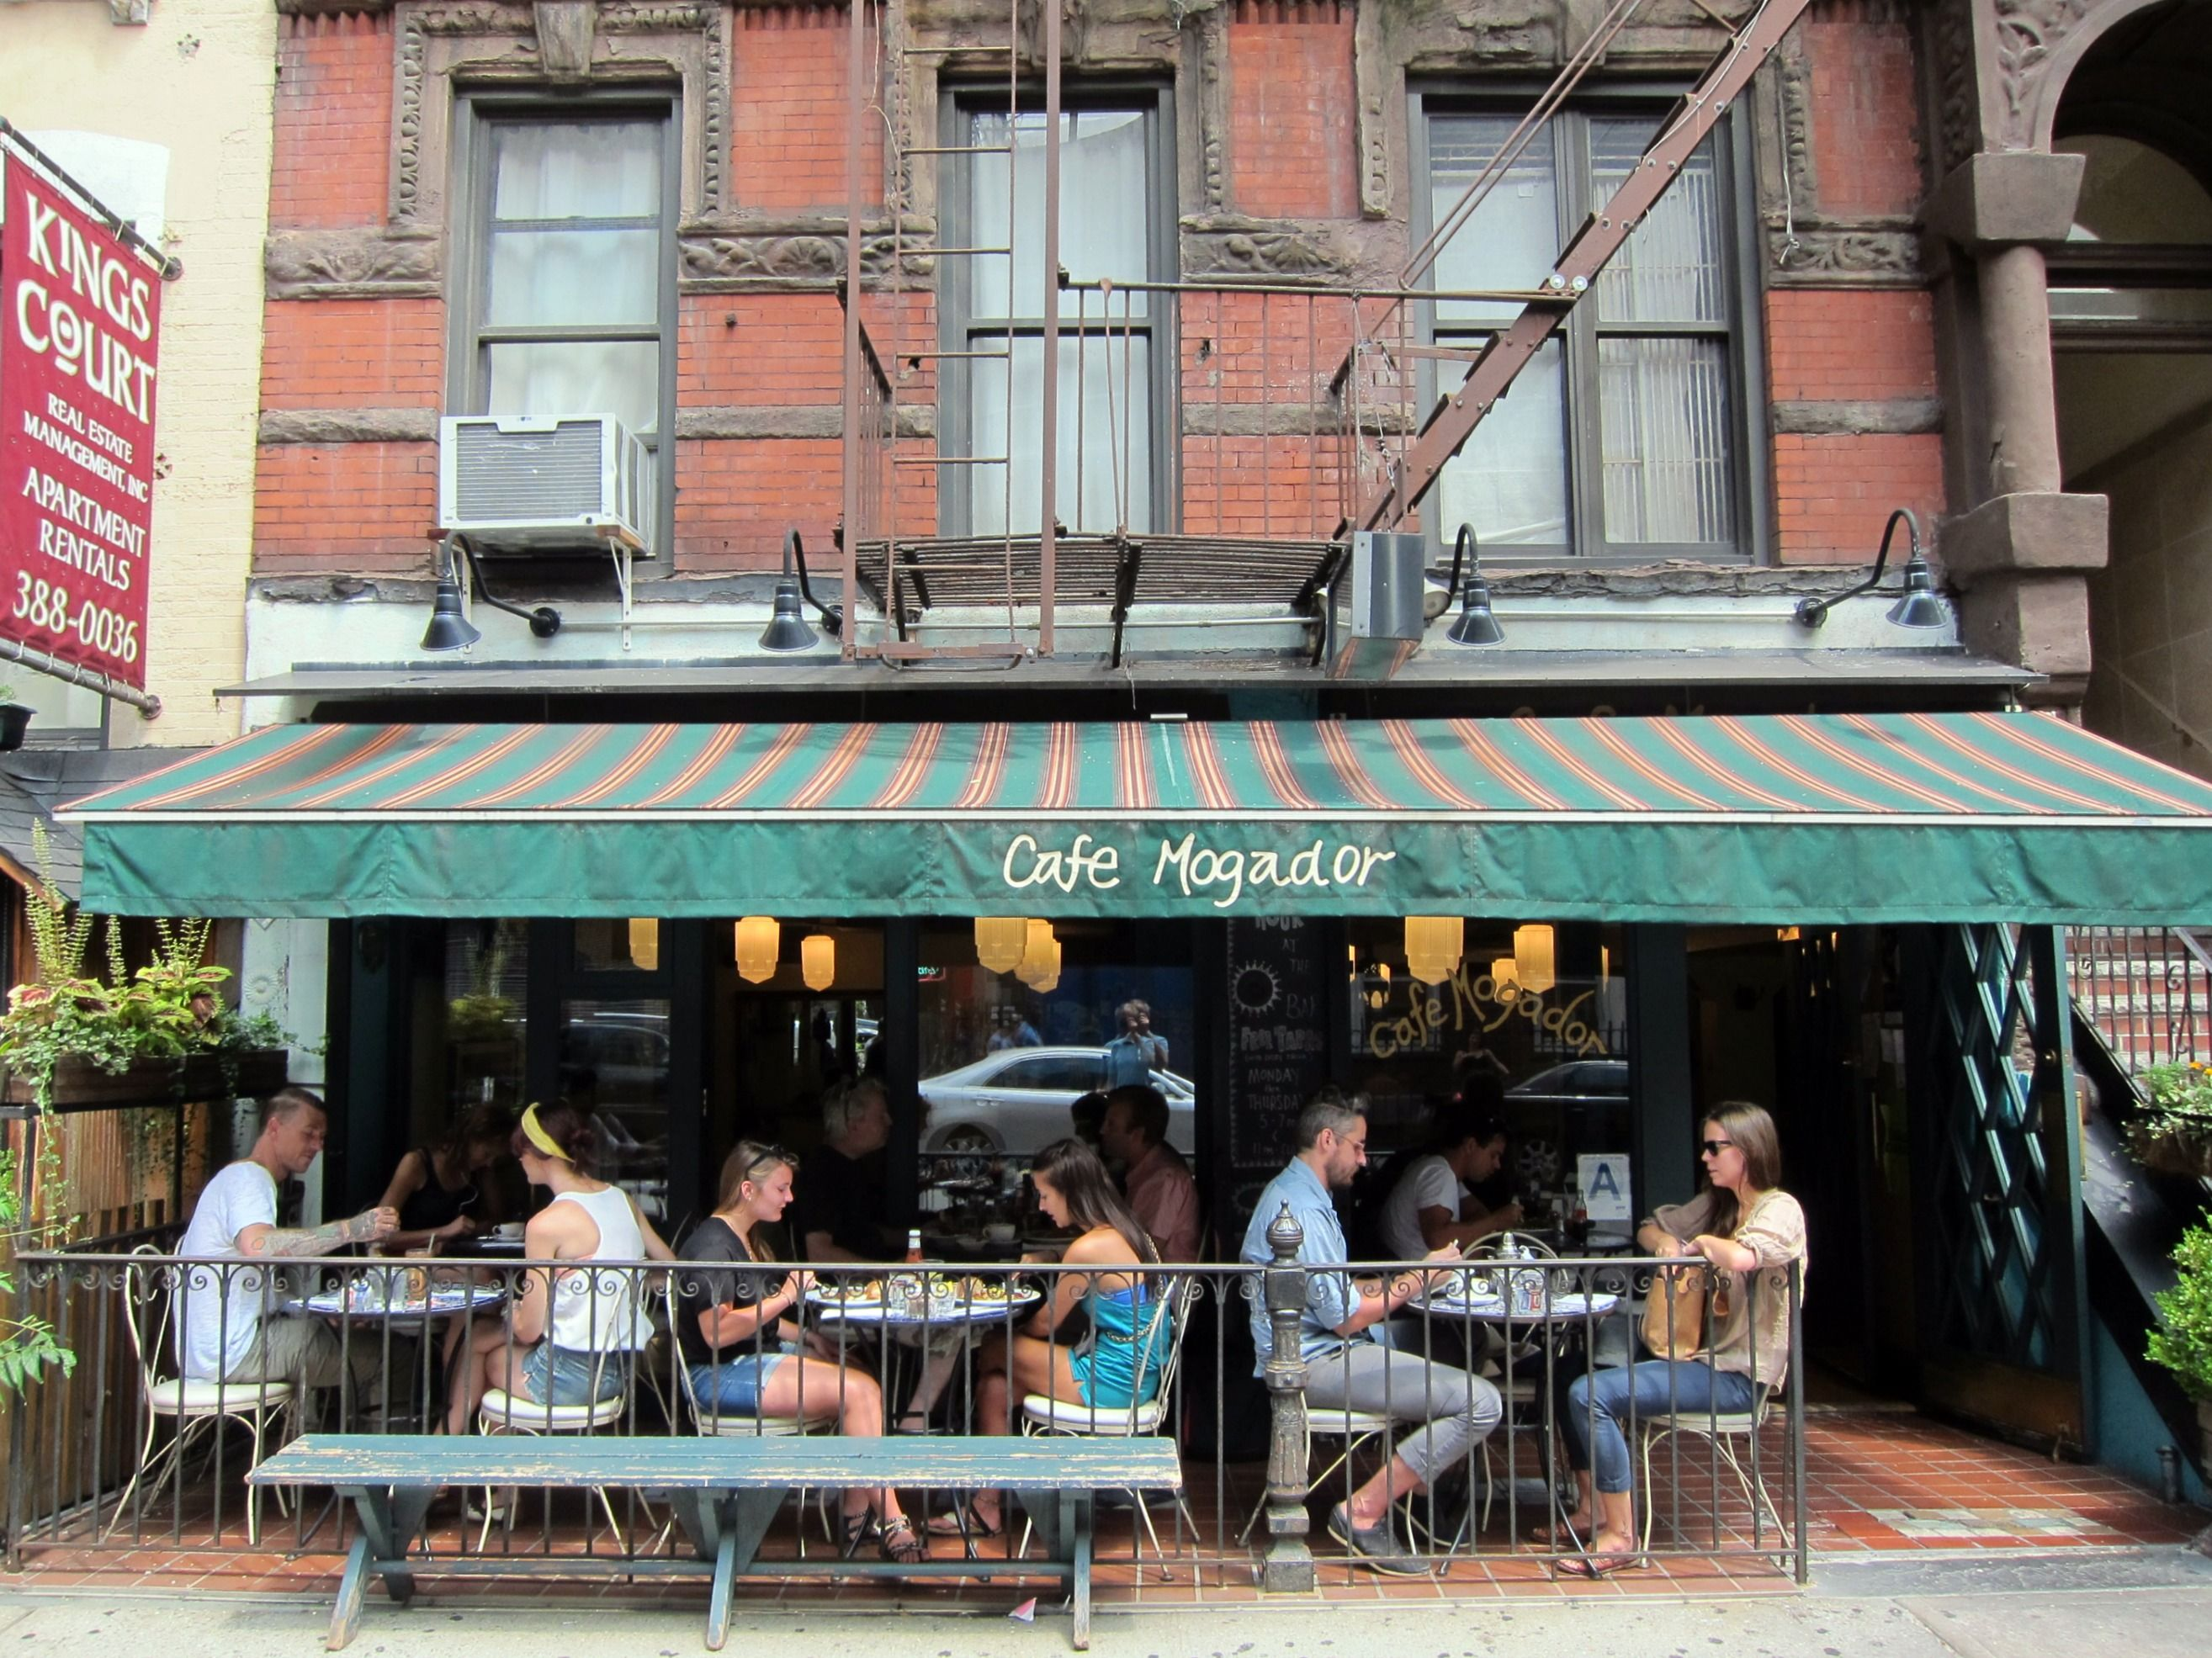 Cafe Mogador Moroccan Mediterranean Cuisine 101 St Marks Pl New York Ny